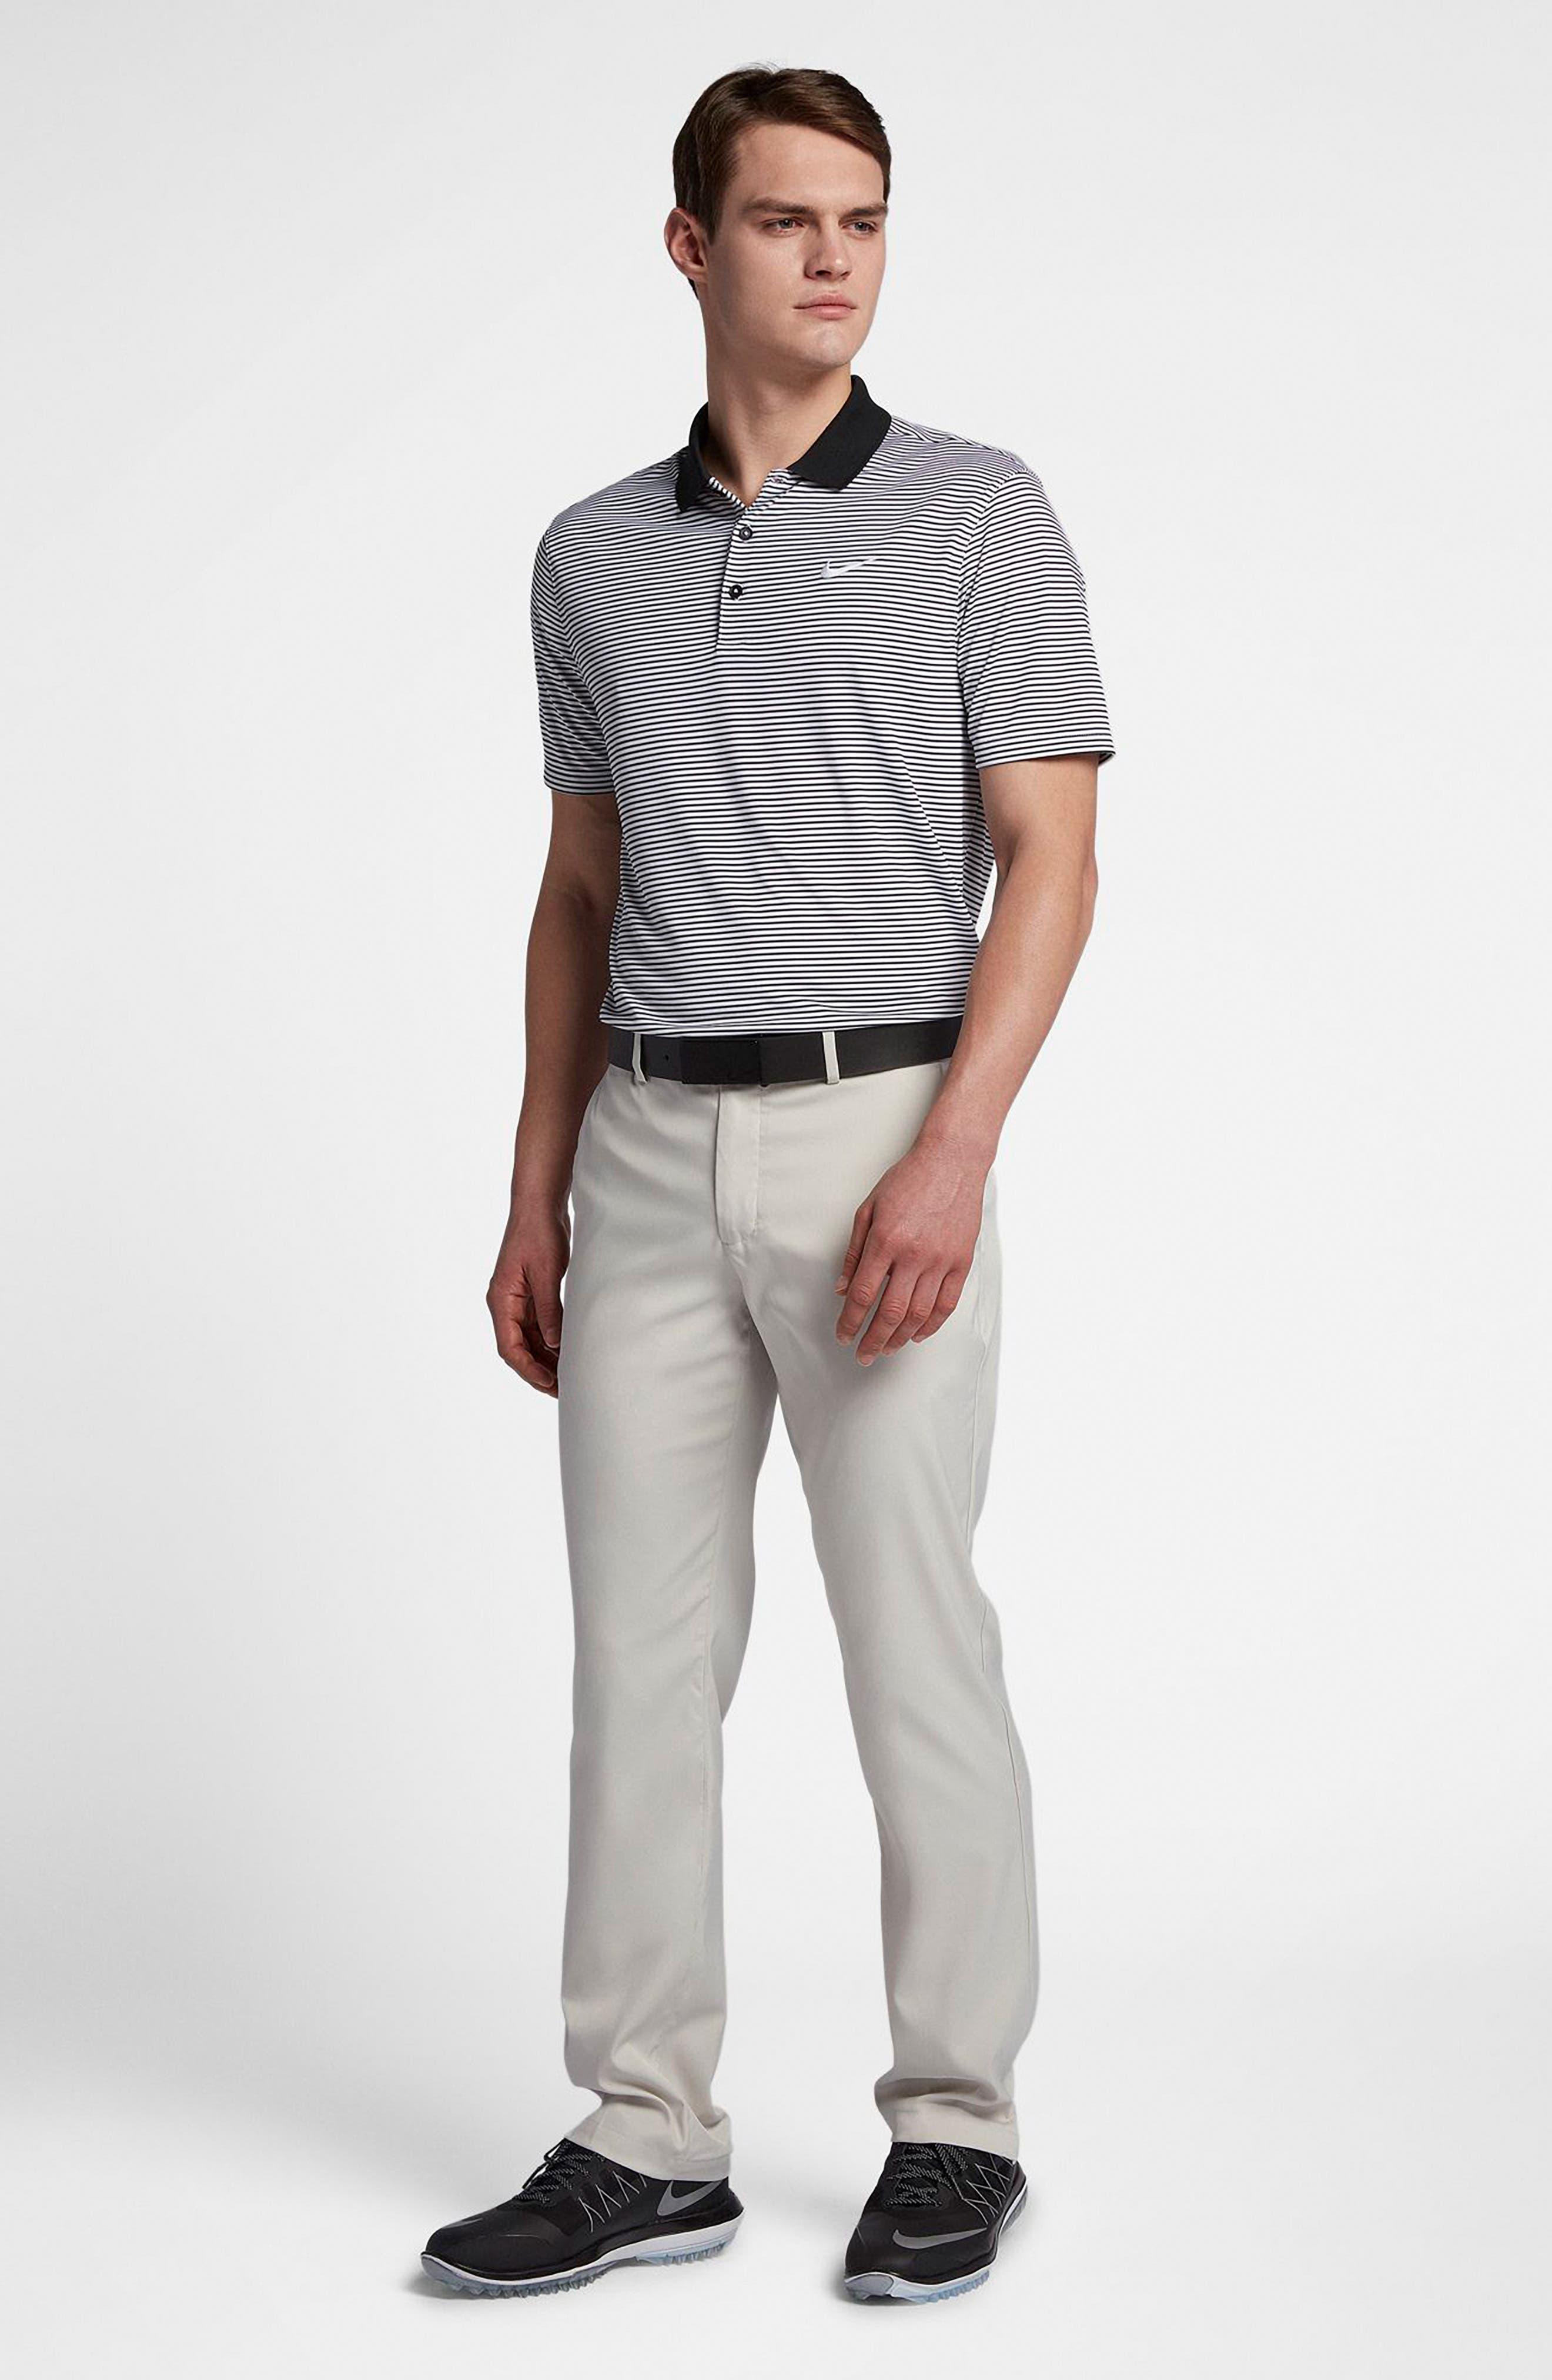 Flat Front Dri-FIT Tech Golf Pants,                             Alternate thumbnail 6, color,                             LIGHT BONE/ LIGHT BONE